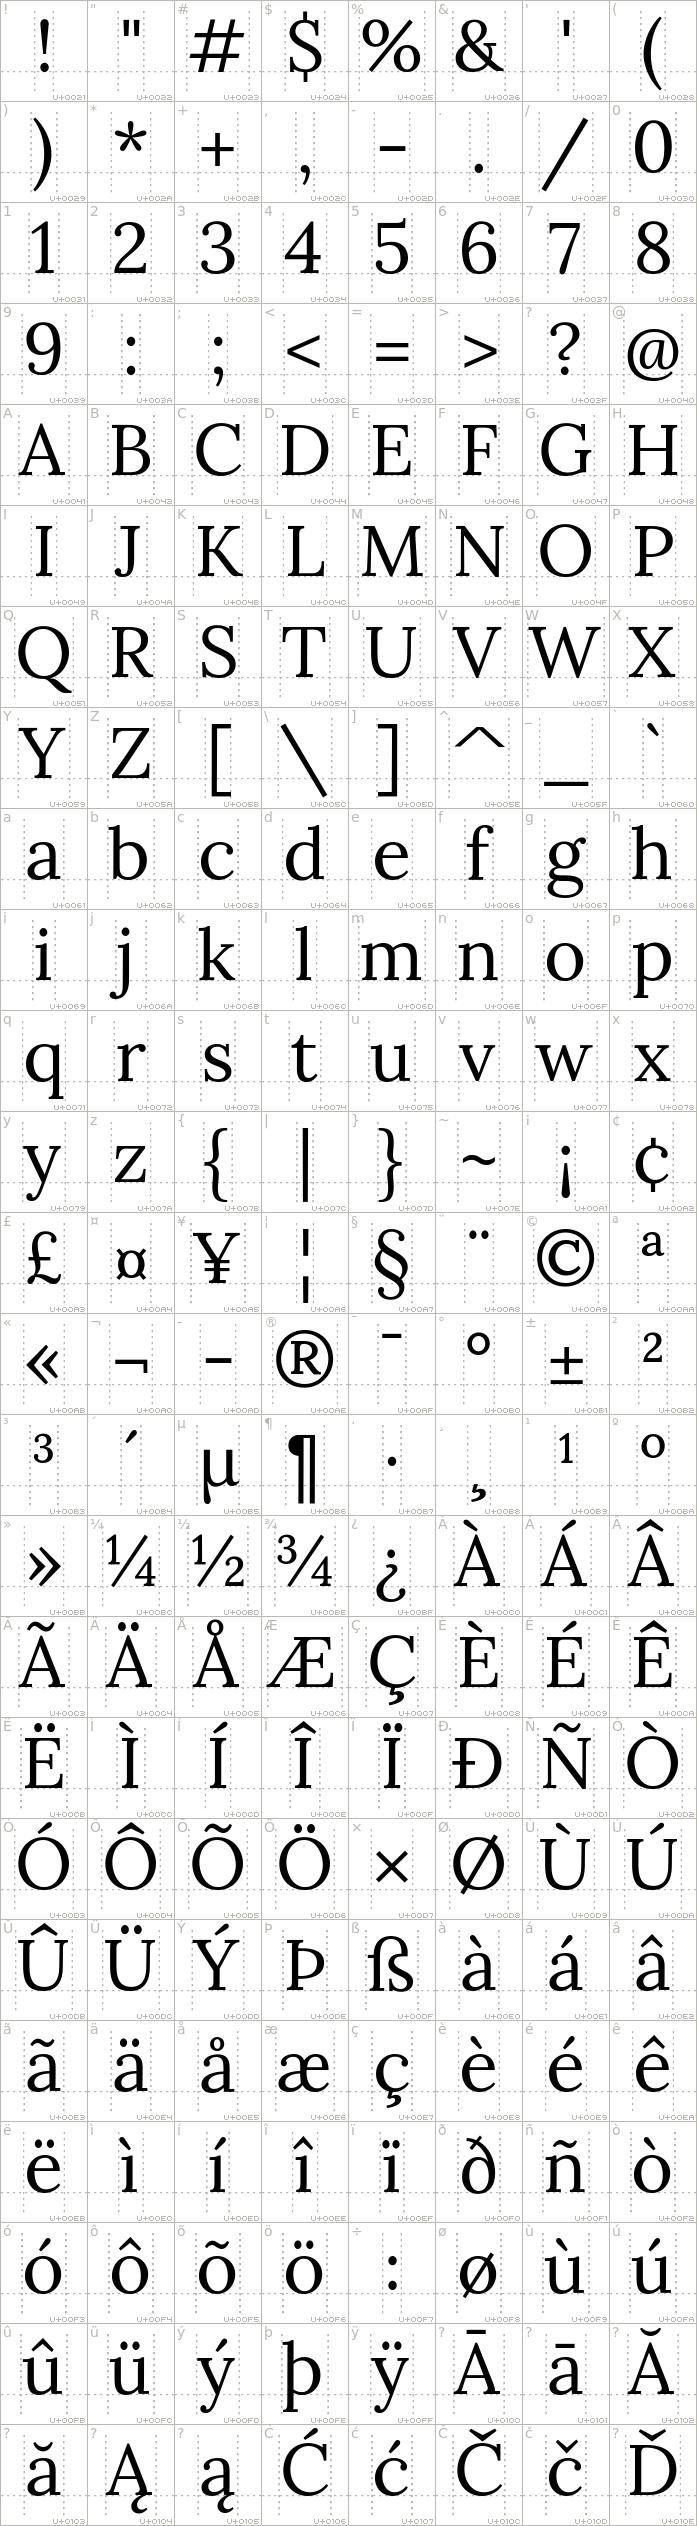 lora.regular.character-map-1